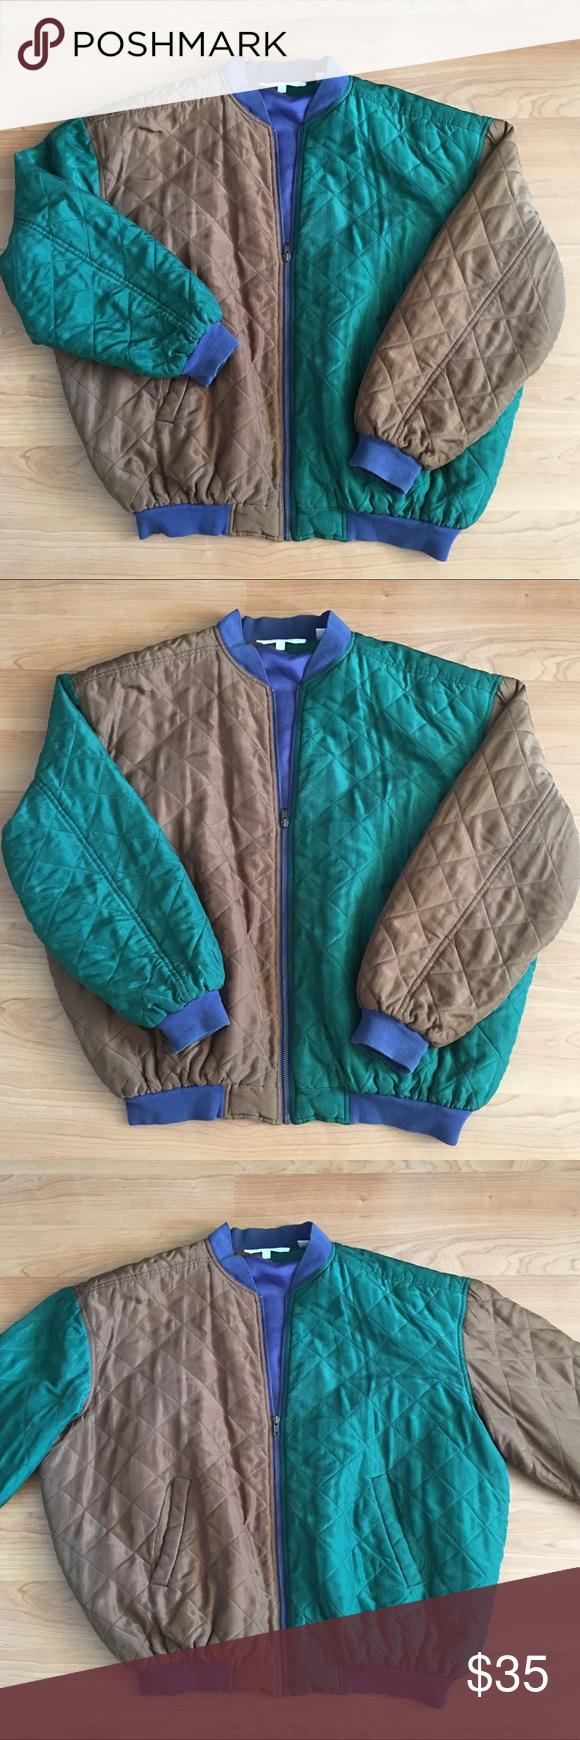 7663e770ce Vintage Perry Ellis color block bomber jacket Great Vintage Perry Ellis  color block quilted bomber style